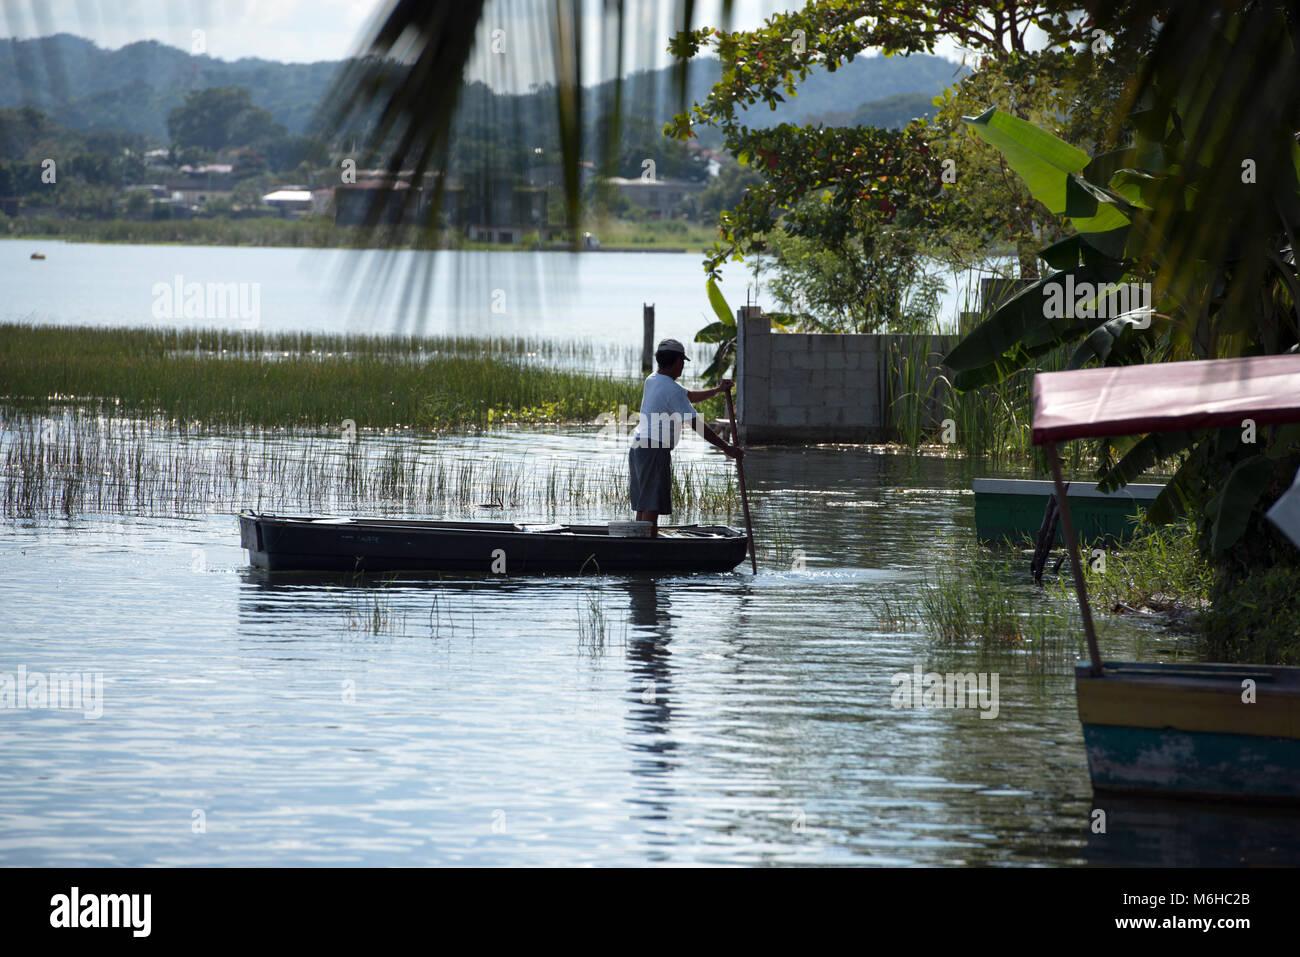 An indigenous, ethnic Itza Maya man in a boat making a living from fishing on Lake Peten, Guatemala. - Stock Image